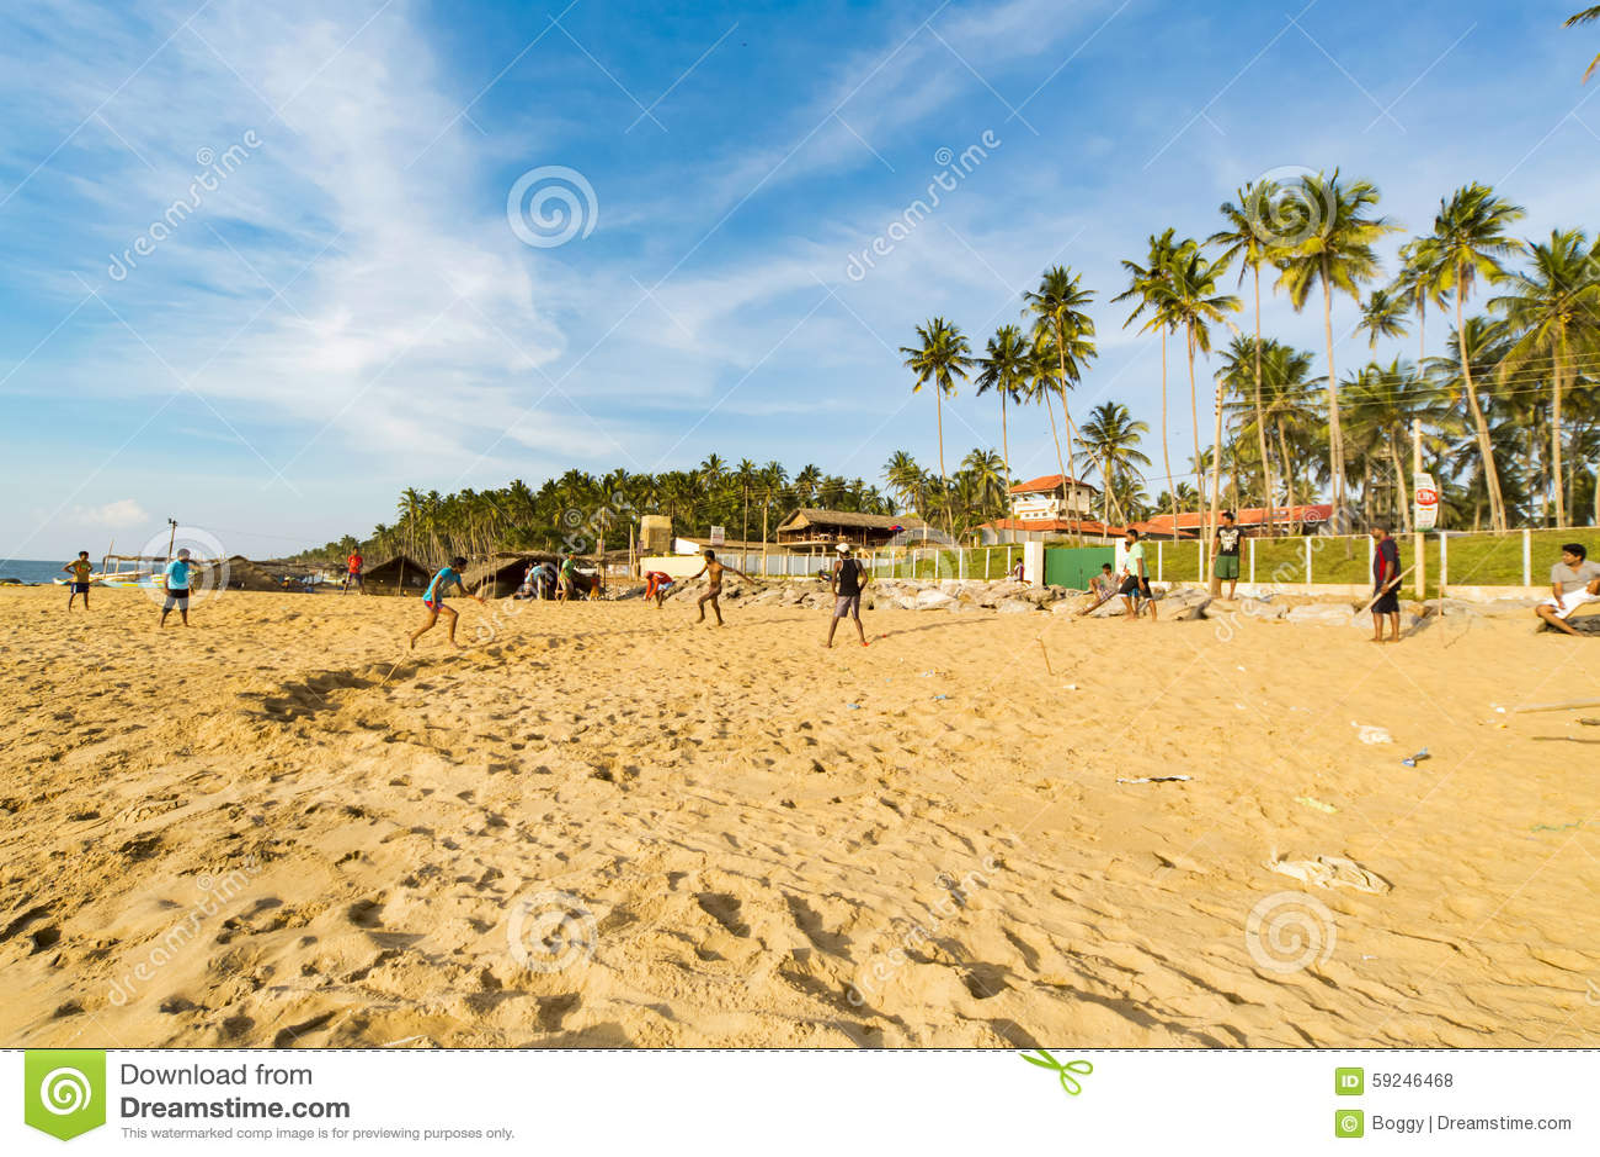 Playa de Negombo en Sri Lanka